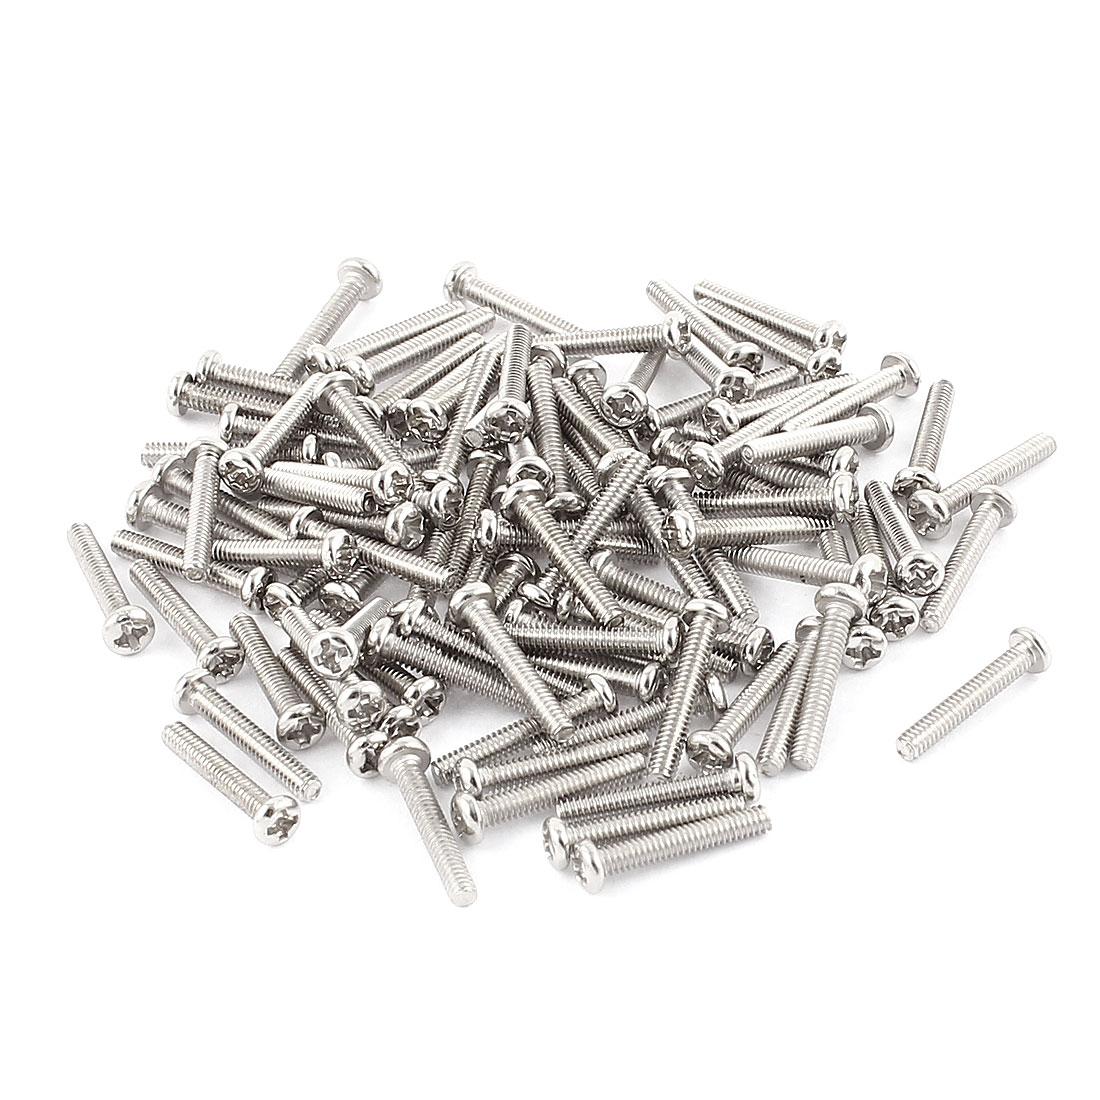 100 Pcs M2x12mm Stainless Steel Round Head Phillips Machine Screws Bolts